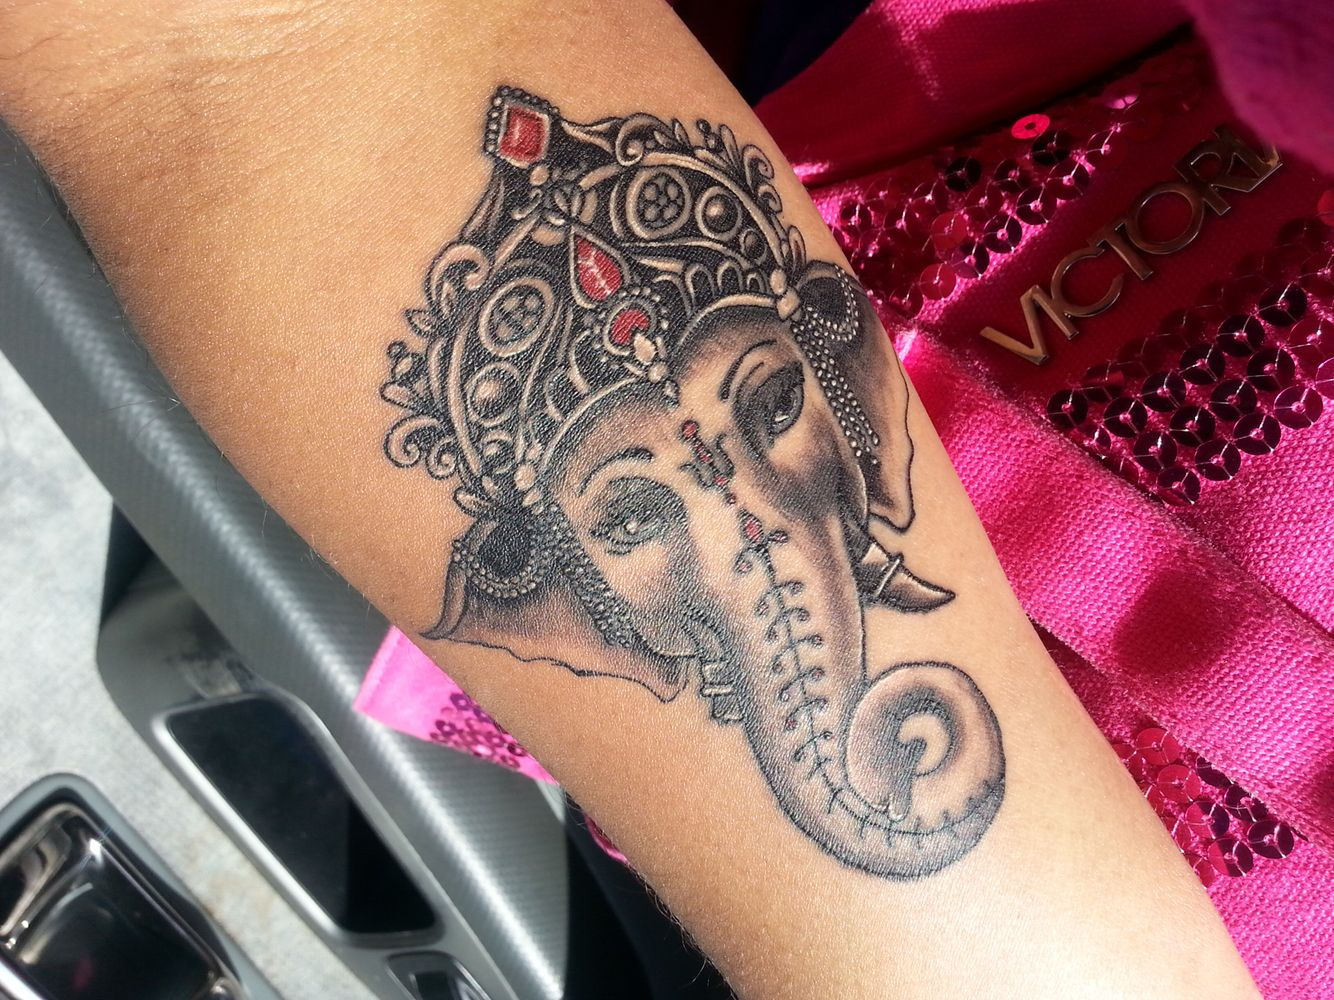 11 ganesha tattoo designs ideas and samples - Protector Against All Obstacles Ganesha Tattoo Hindu Elephant